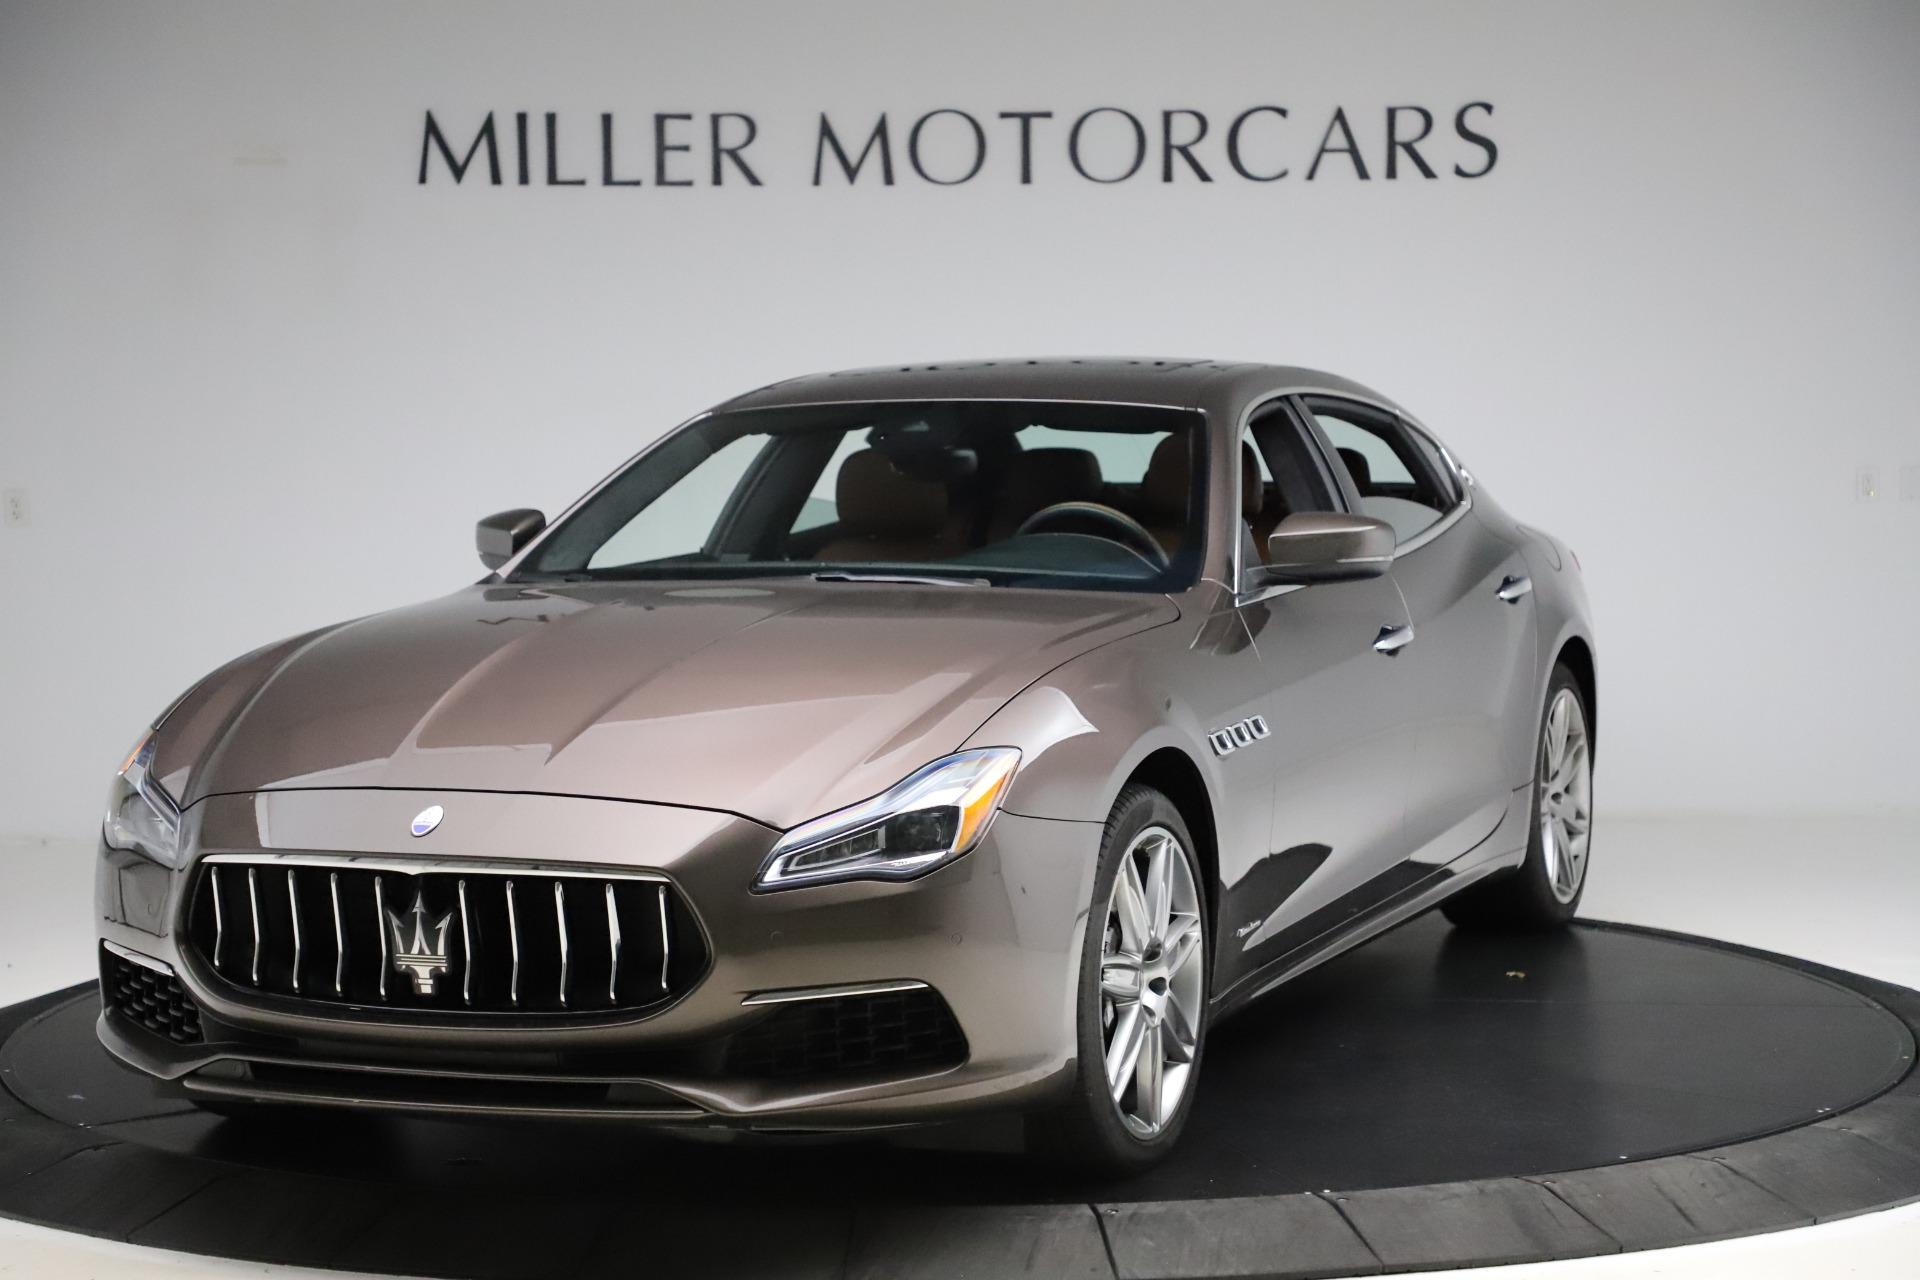 Used 2018 Maserati Quattroporte S Q4 GranLusso for sale $69,900 at Bentley Greenwich in Greenwich CT 06830 1